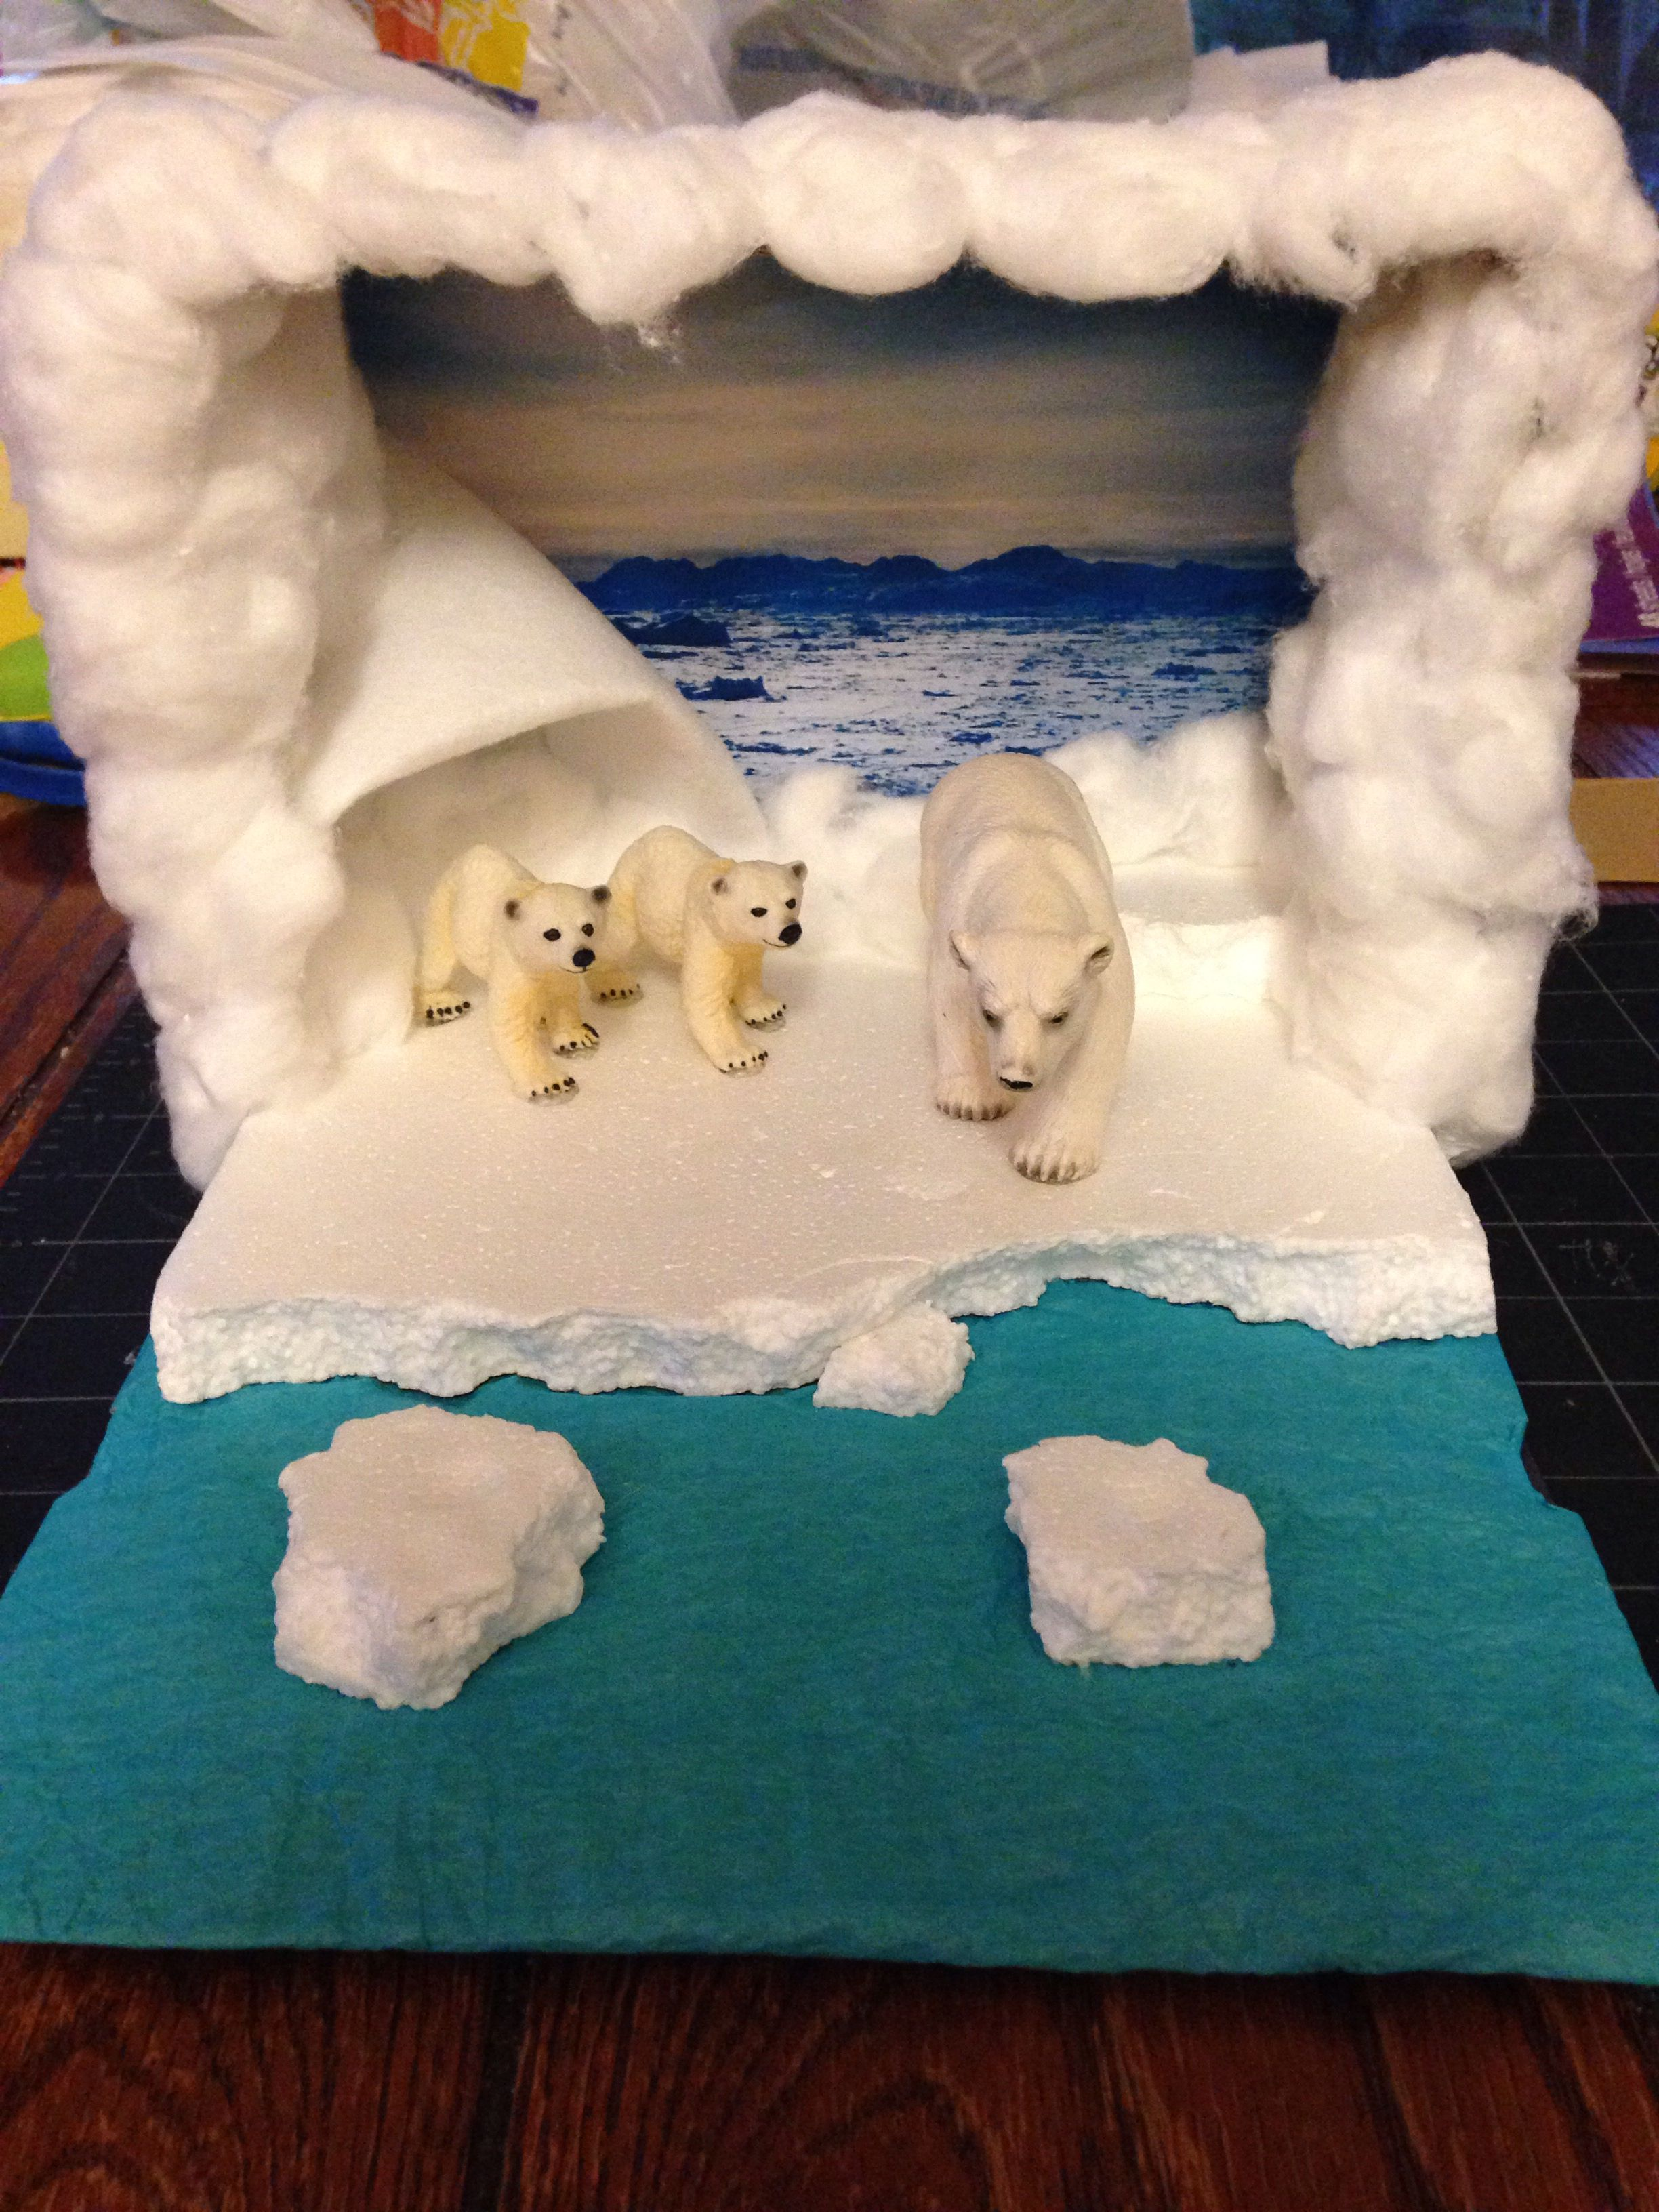 Reed S Polar Bear Diorama